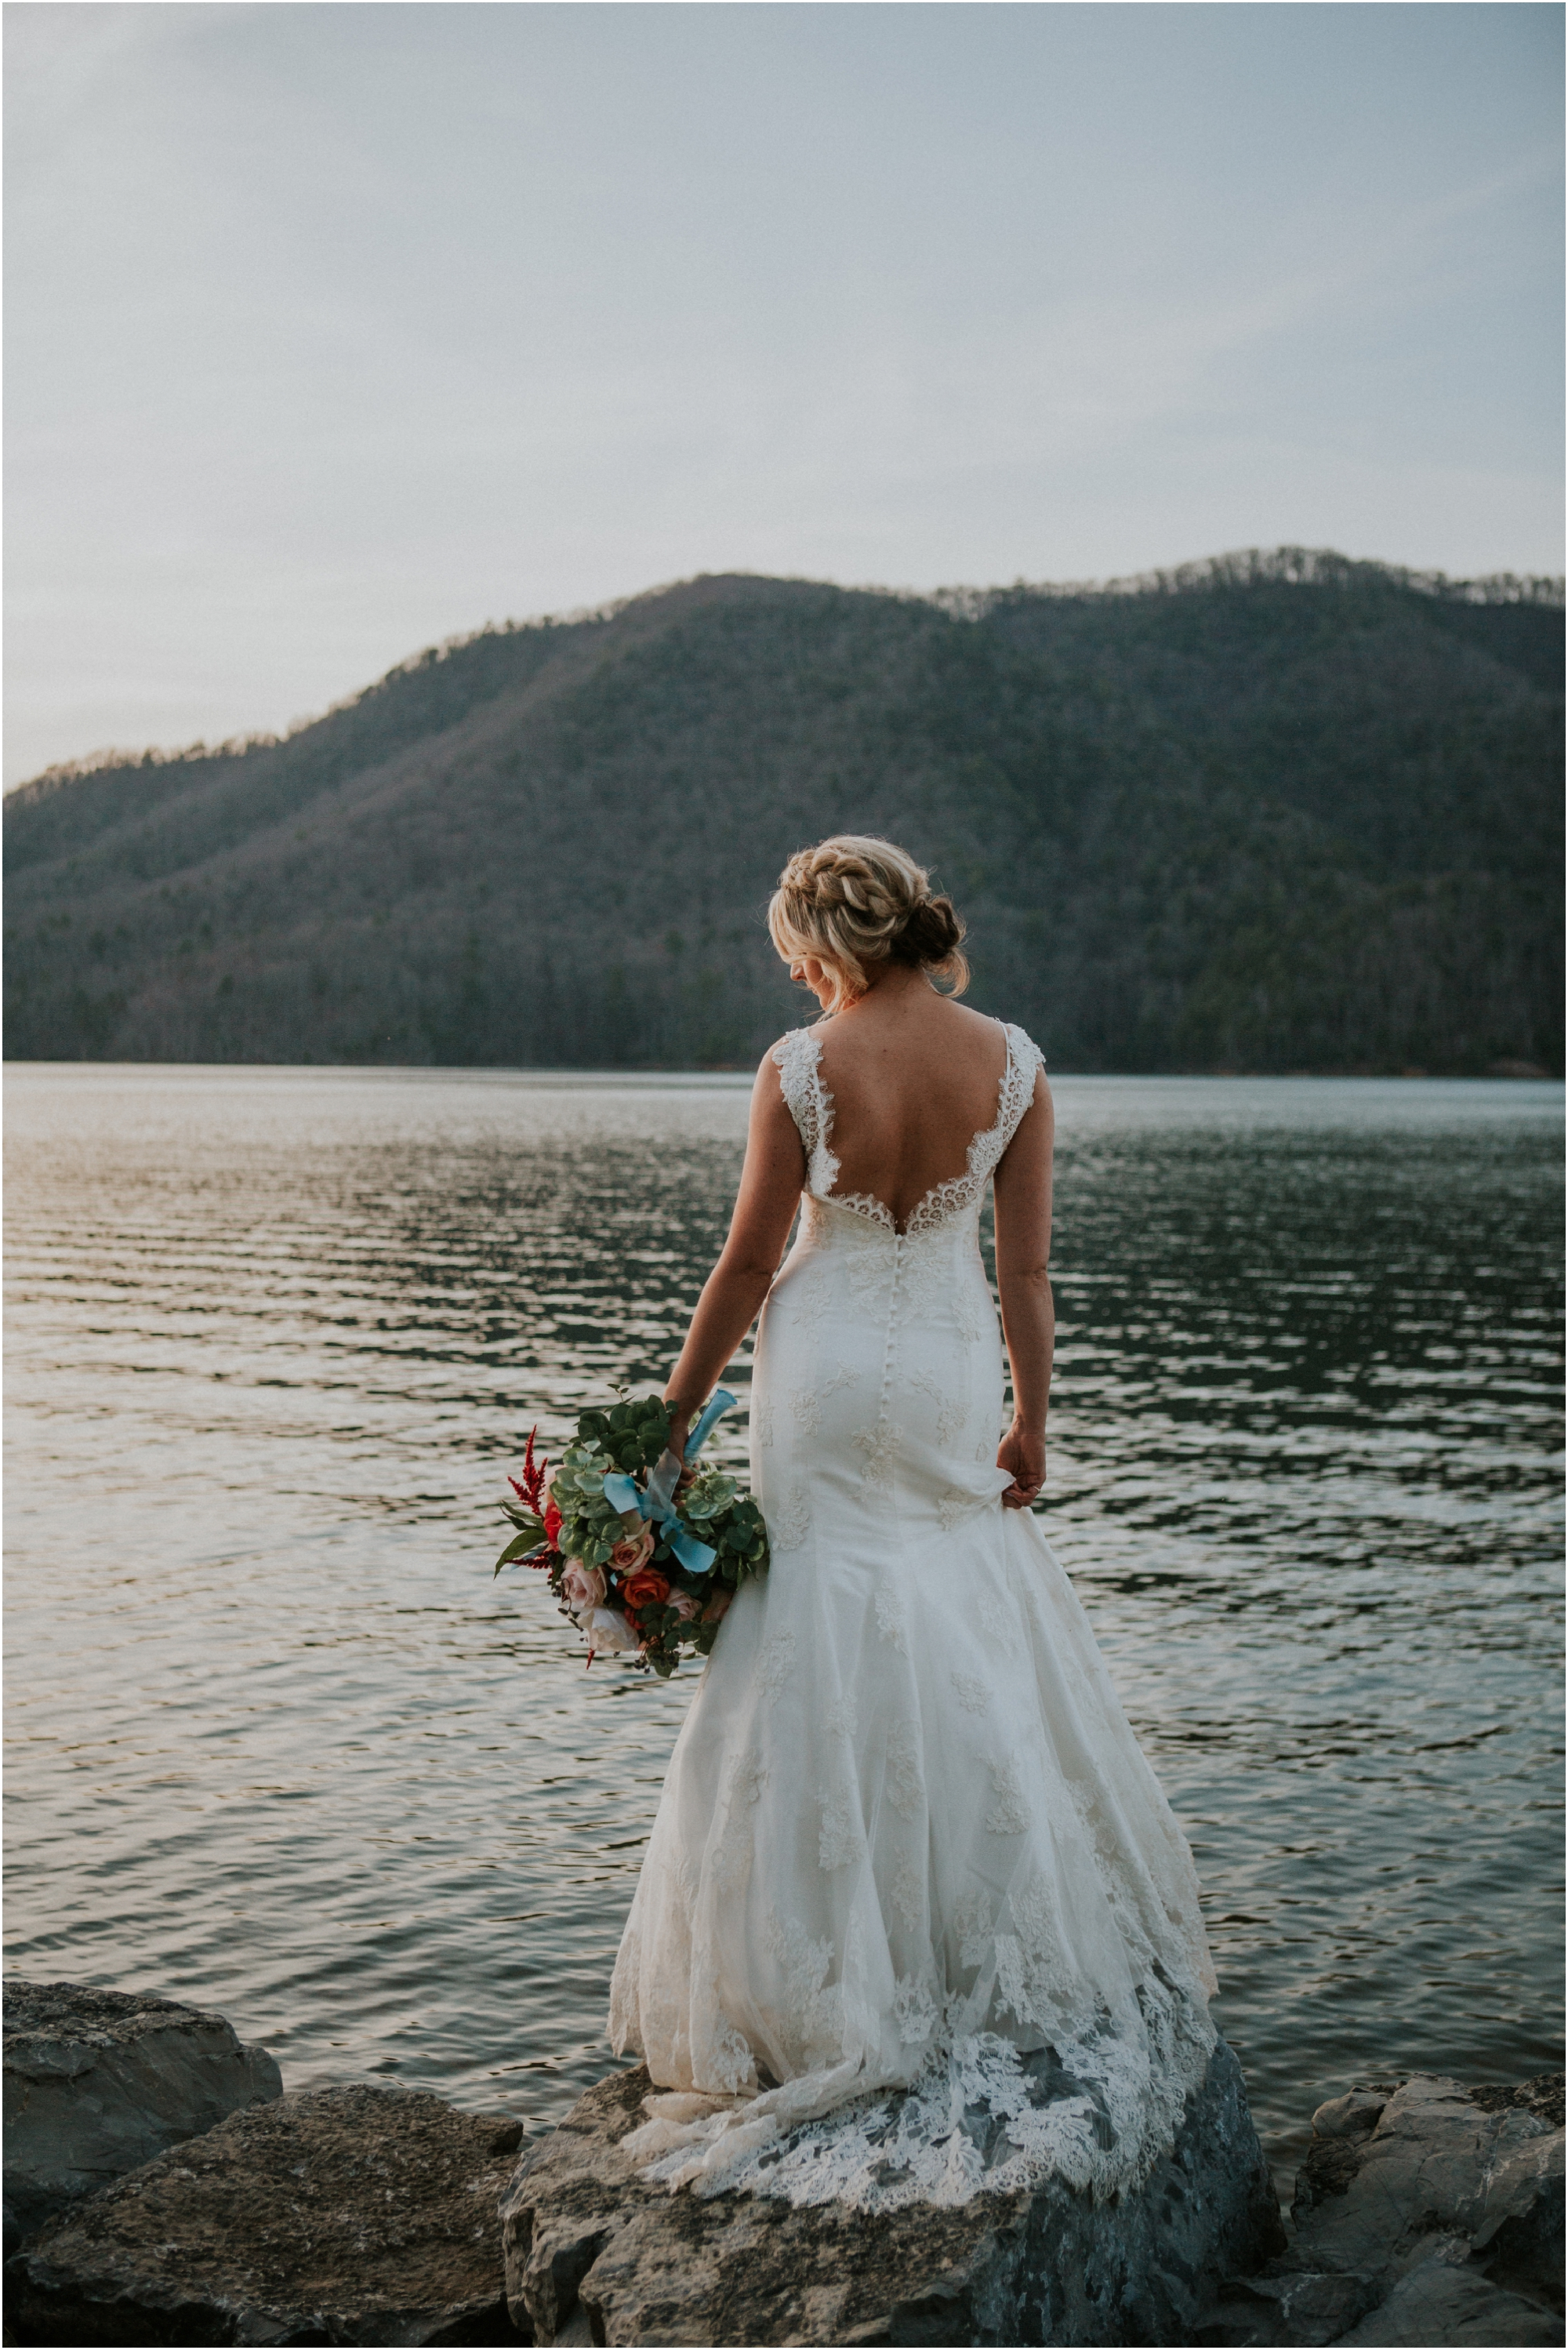 watauga-lake--bohemian-bridal-styled-session-northeast-tennessee-wedding-elopement-photography_0012.jpg